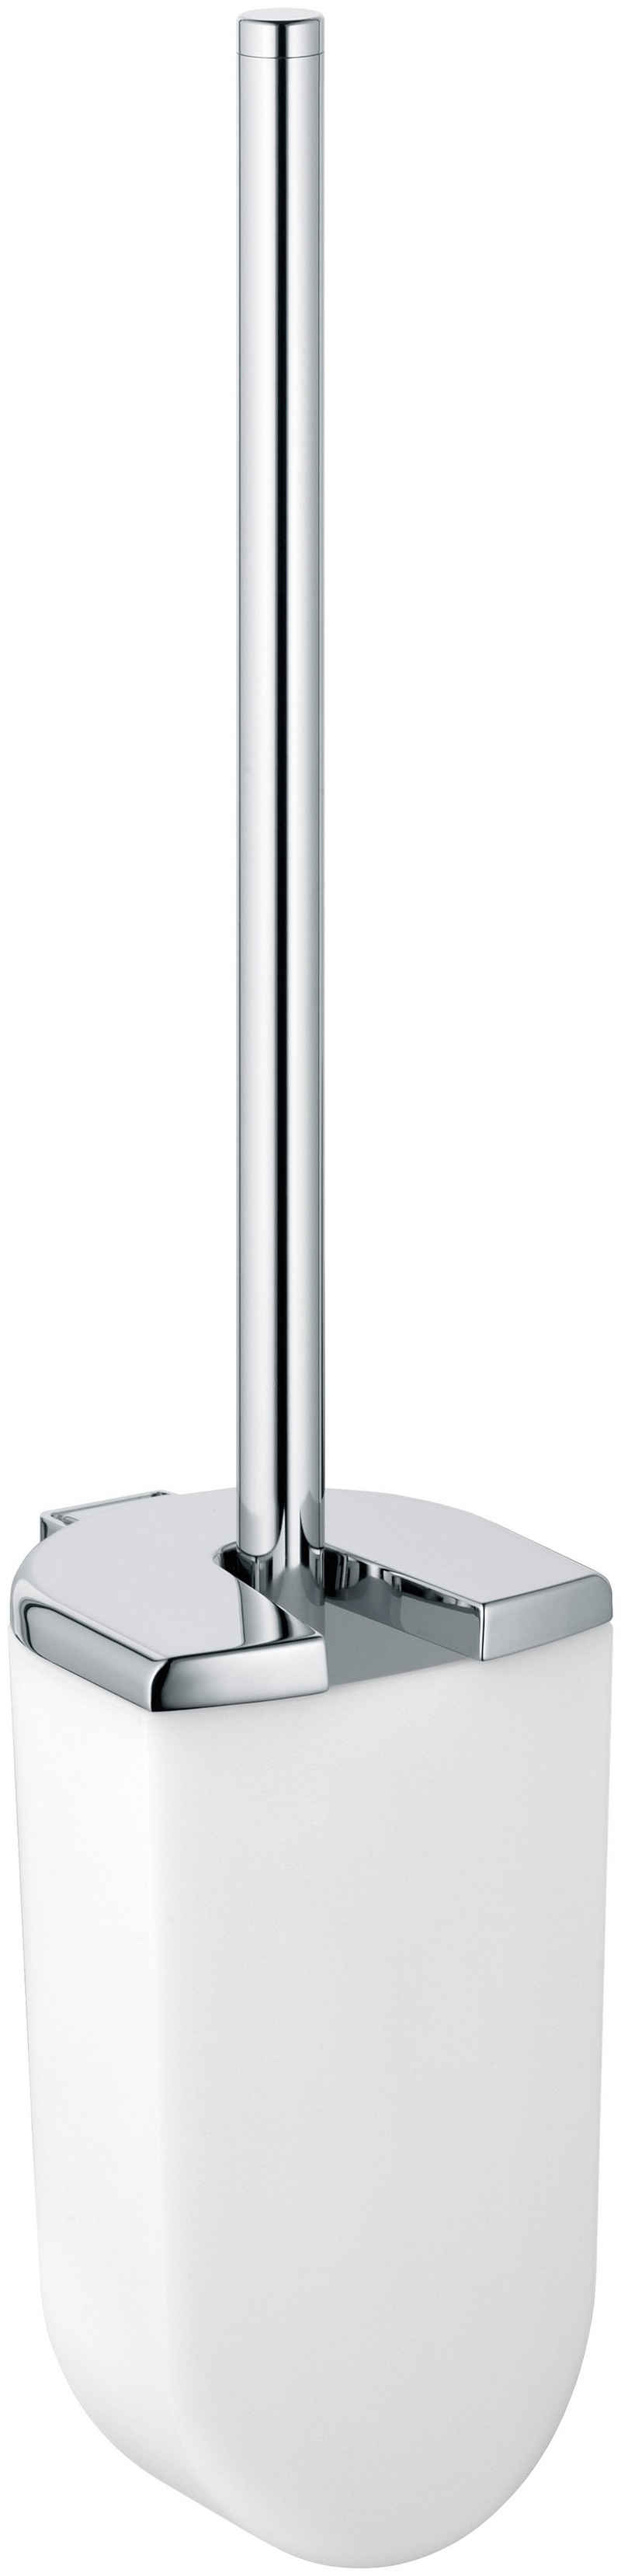 WC-Garnitur »Elegance«, Keuco, Opak-Kunststoff mattiert, mit Metall-Deckel